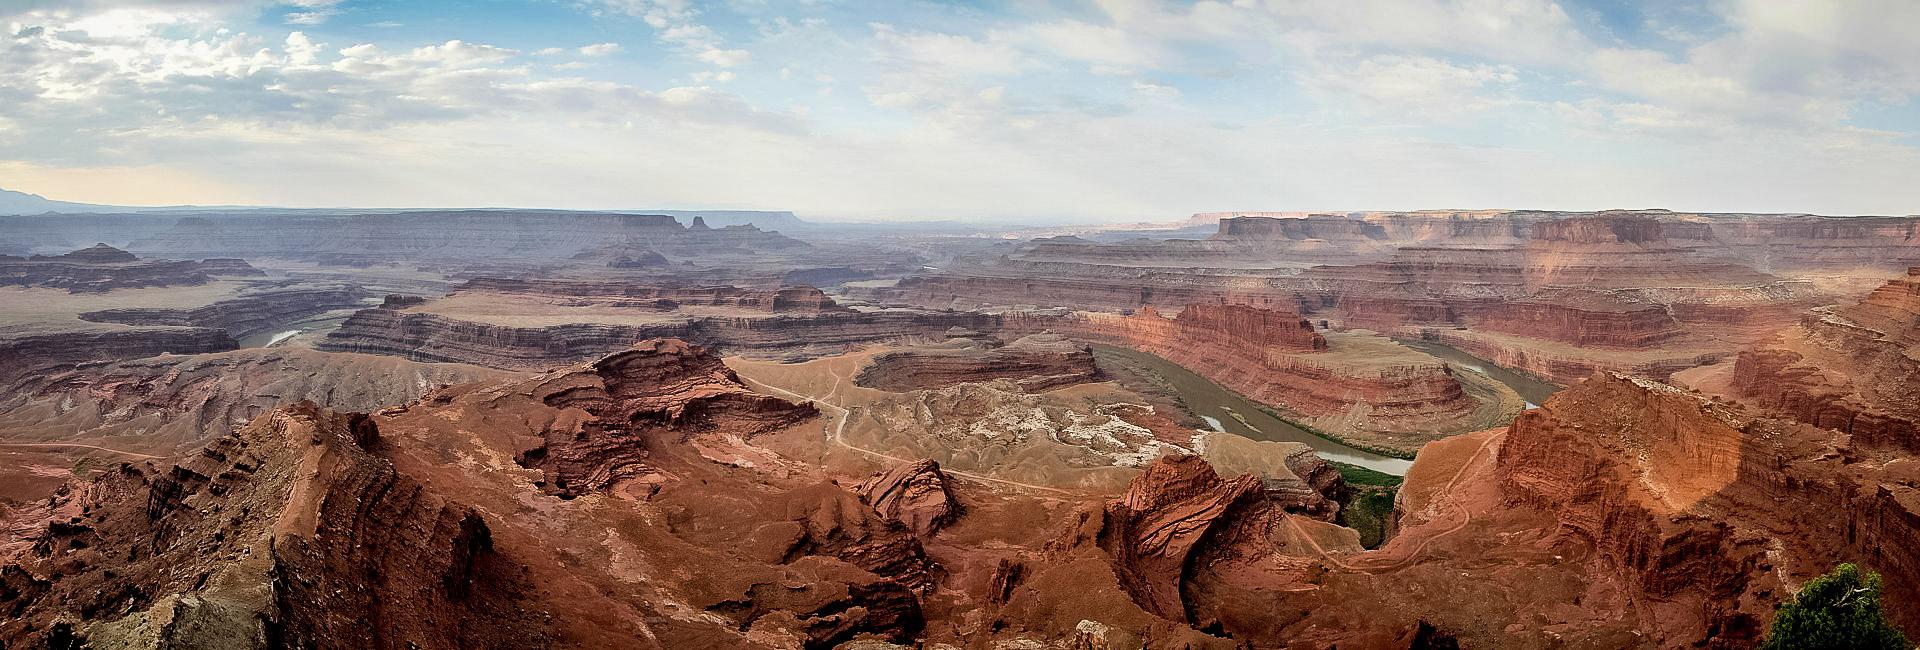 Dead Horsepoint SP: die Colorado-Schleife